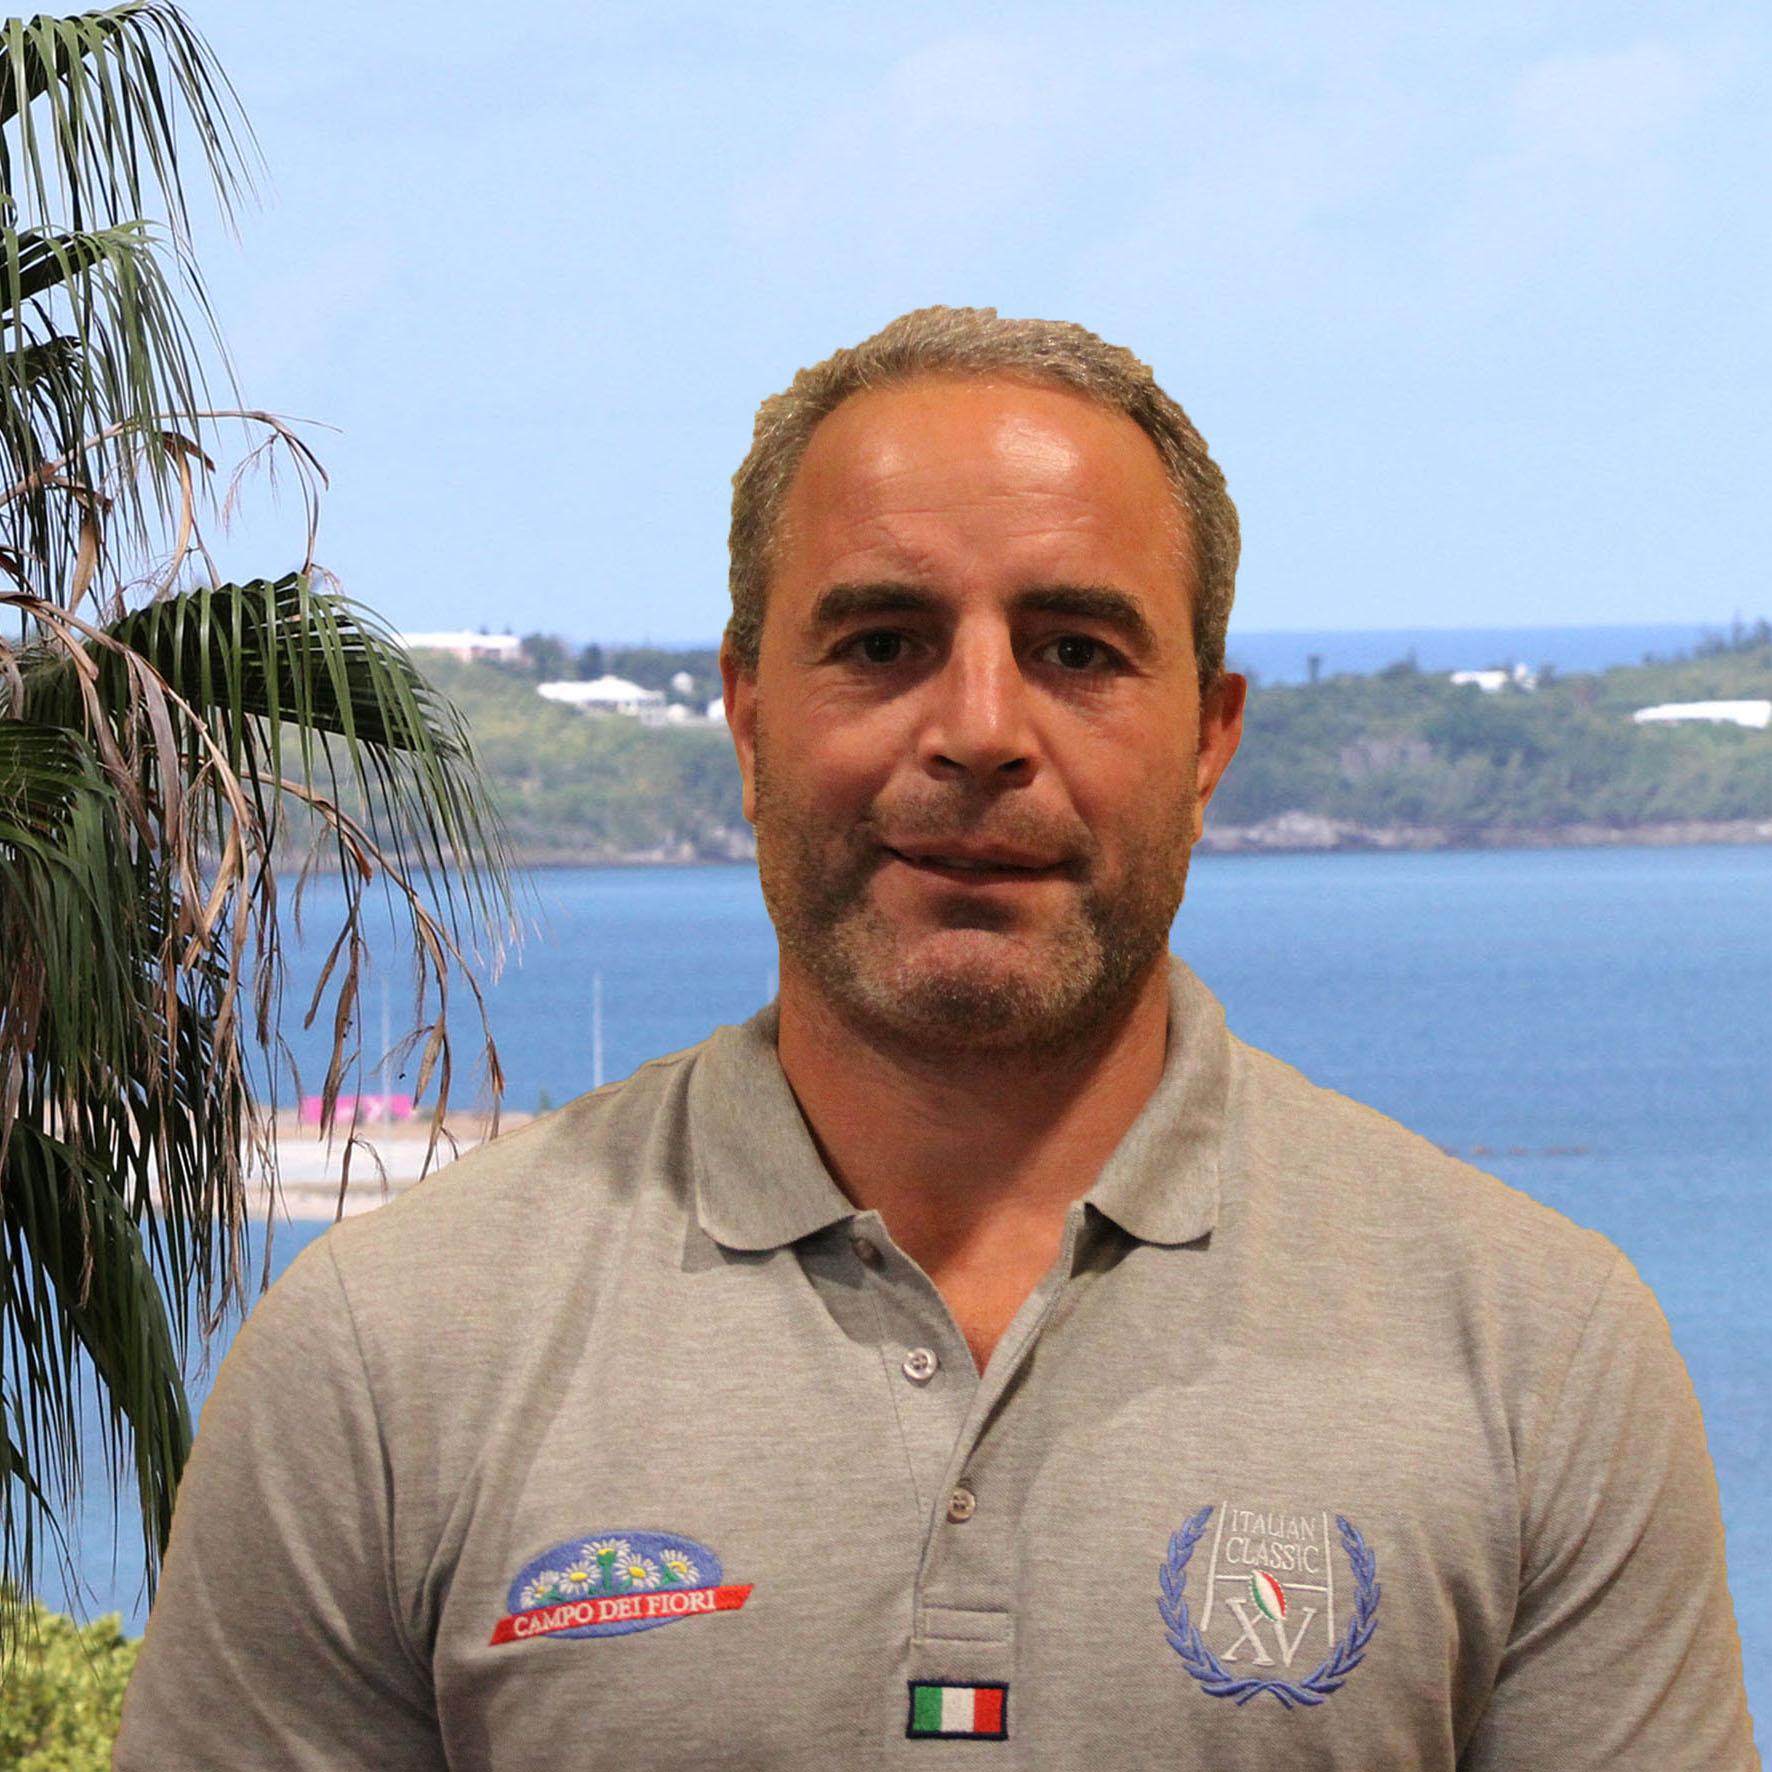 https://www.rugbyitalianclassicxv.com/wp-content/uploads/2019/04/WorldClassic2018_Bermuda_20181104_00_Damiani_ph_Turchetto.jpg